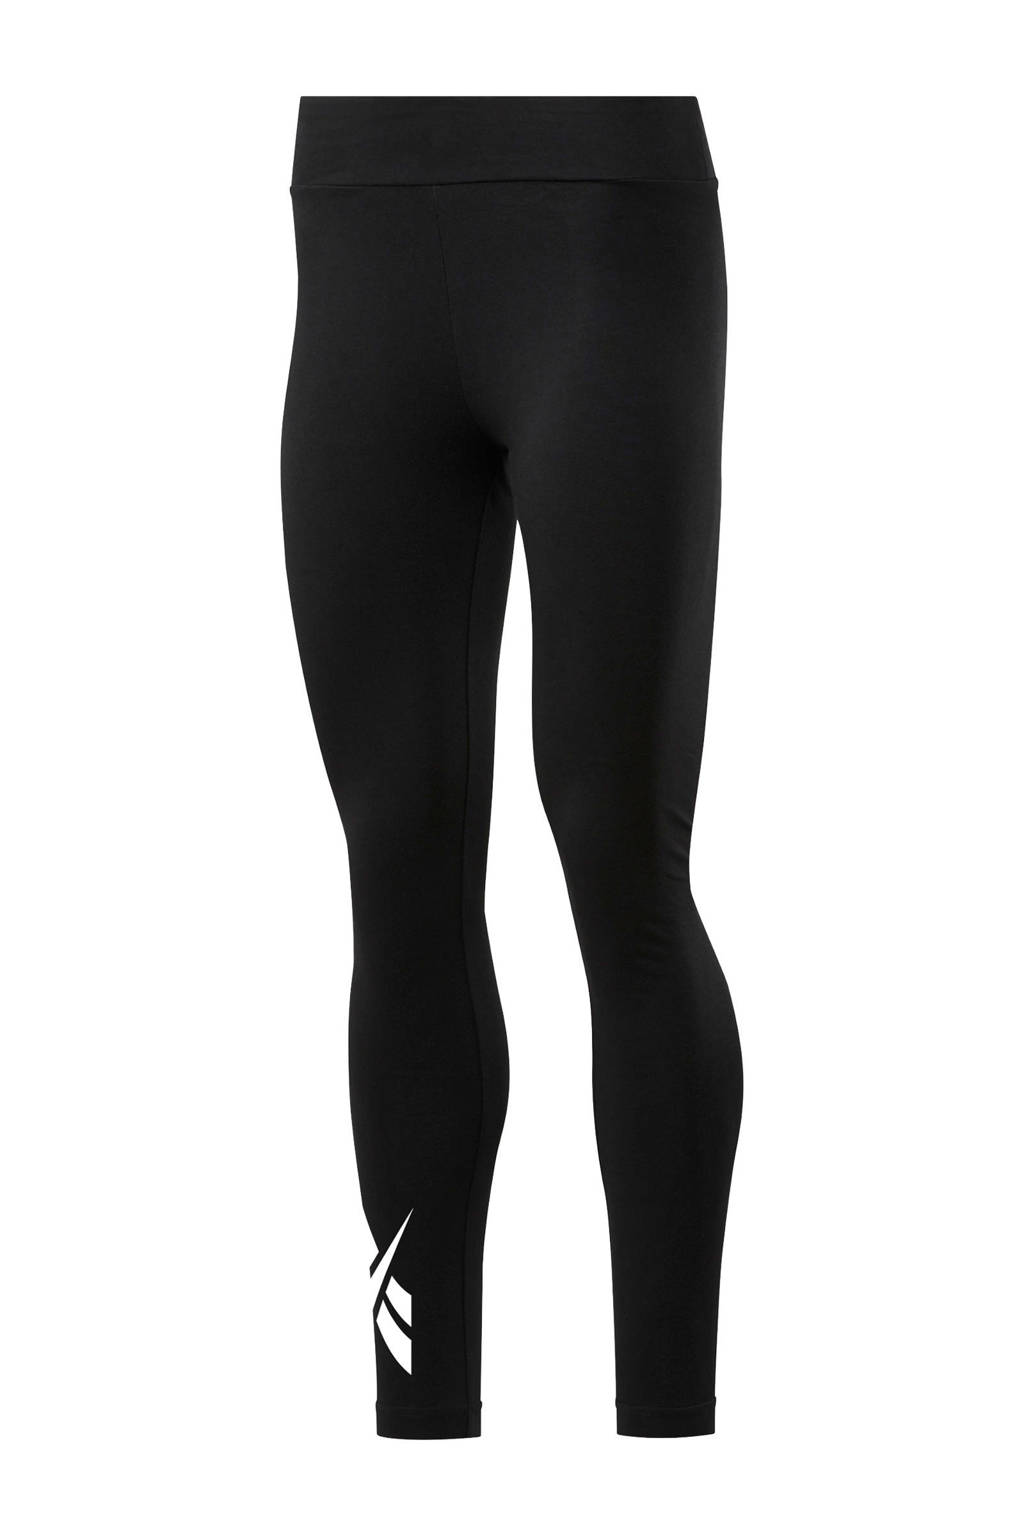 Reebok Classics legging zwart, Zwart